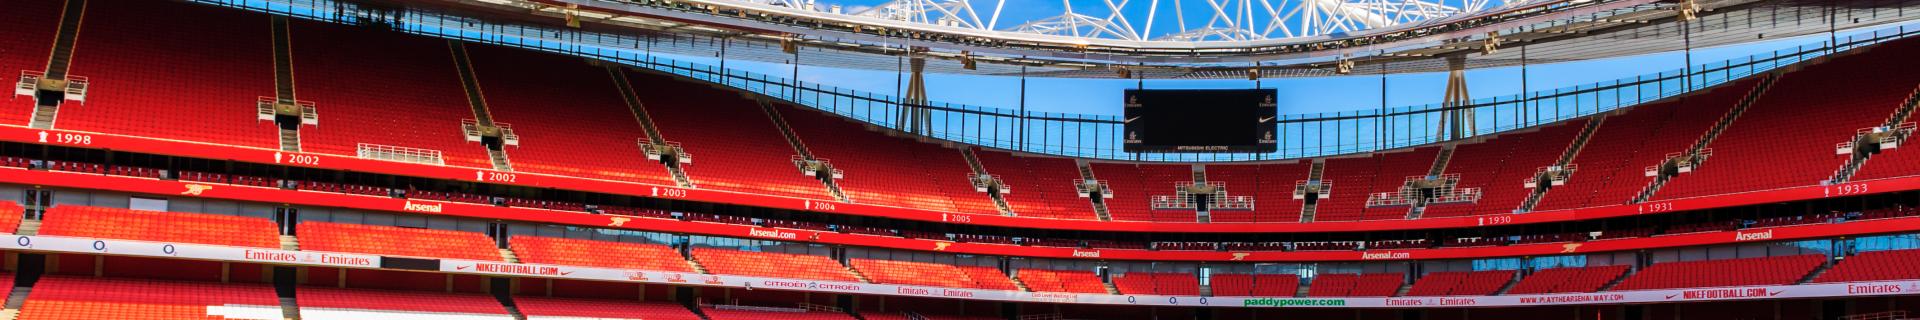 Panoramic photo of the red seats inside Arsenal's Emirates Stadium